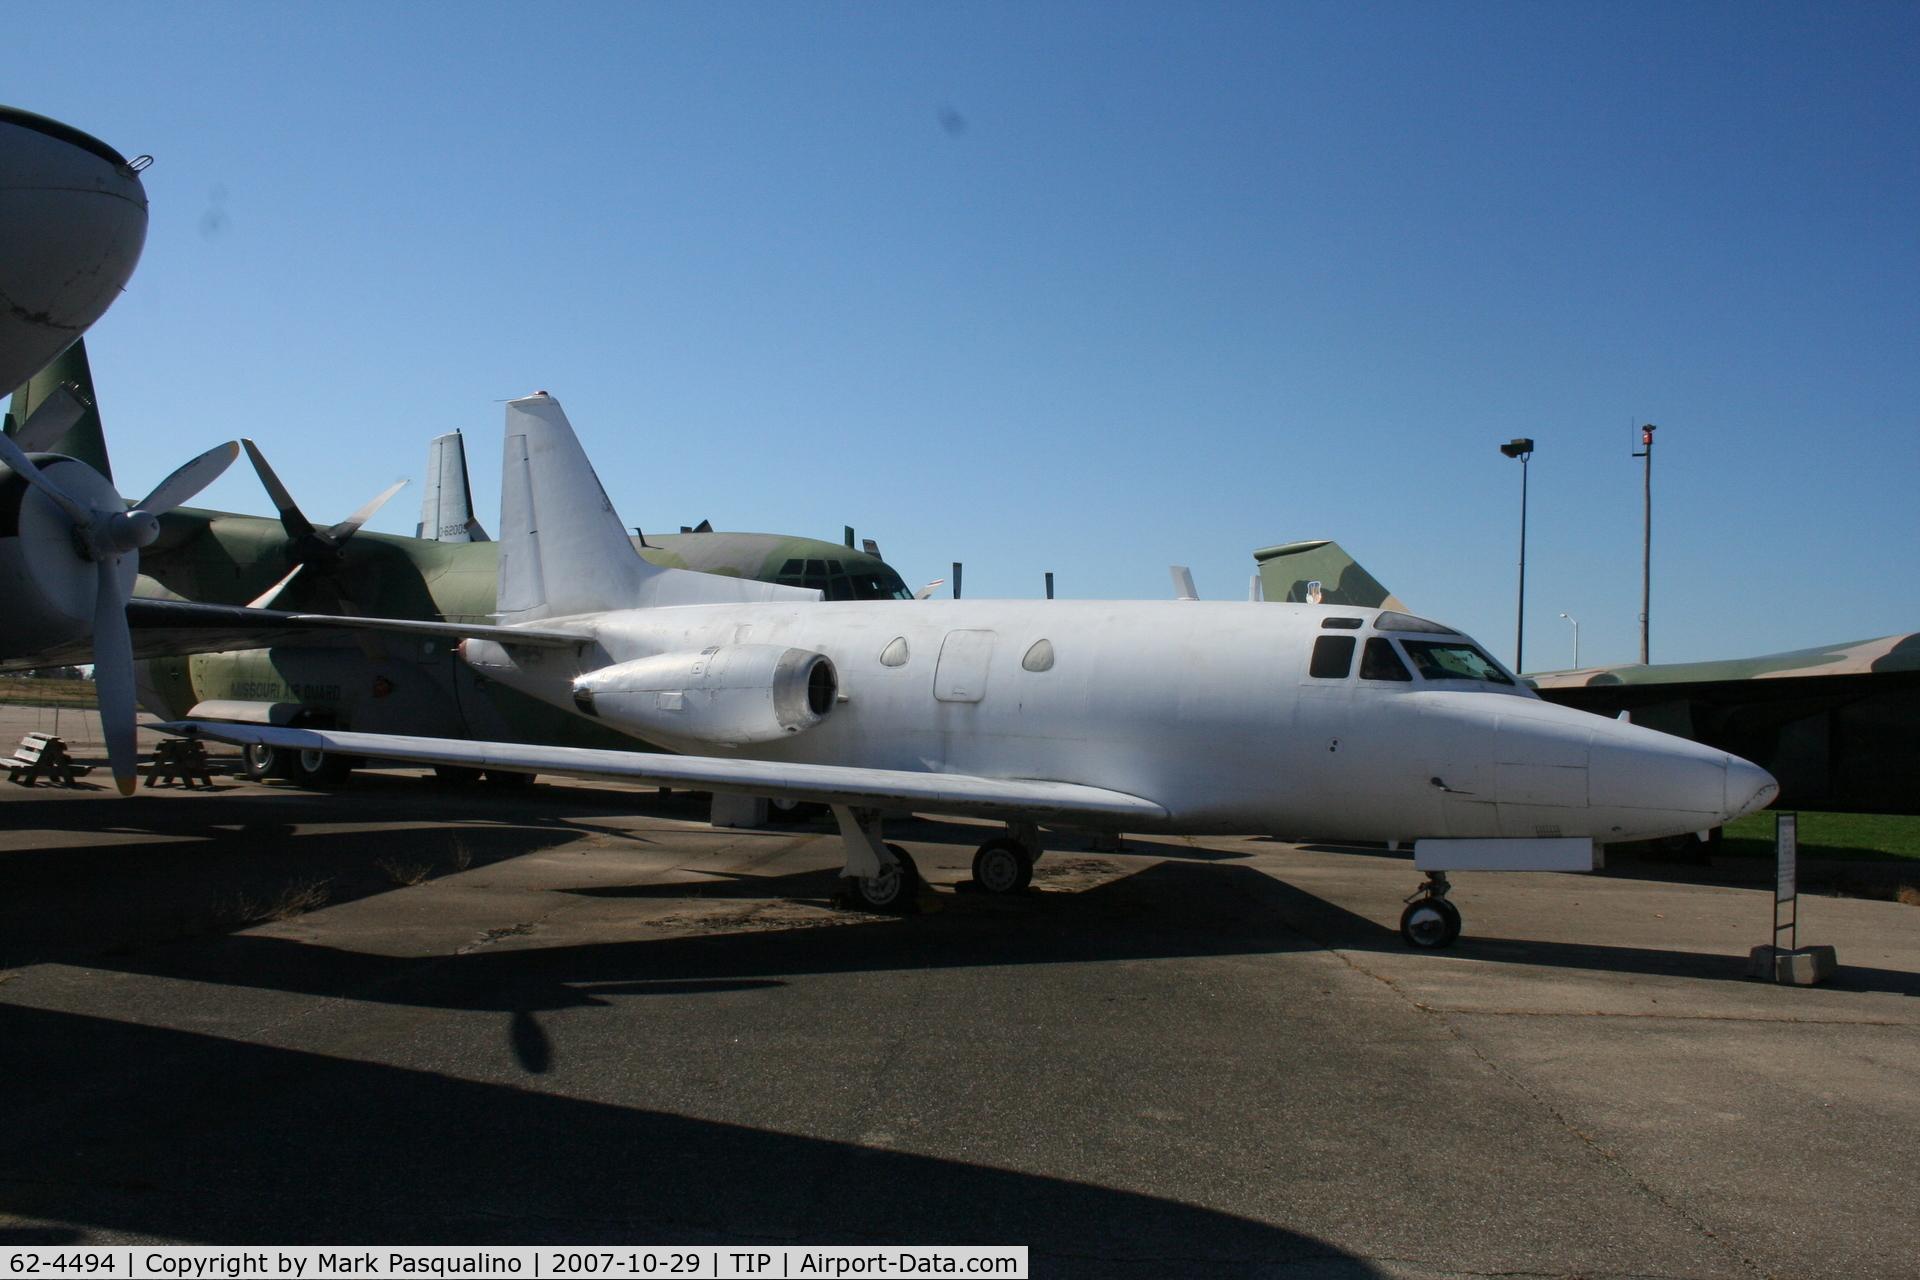 62-4494, 1962 North American CT-39A Sabreliner C/N 276-47, North American T-39